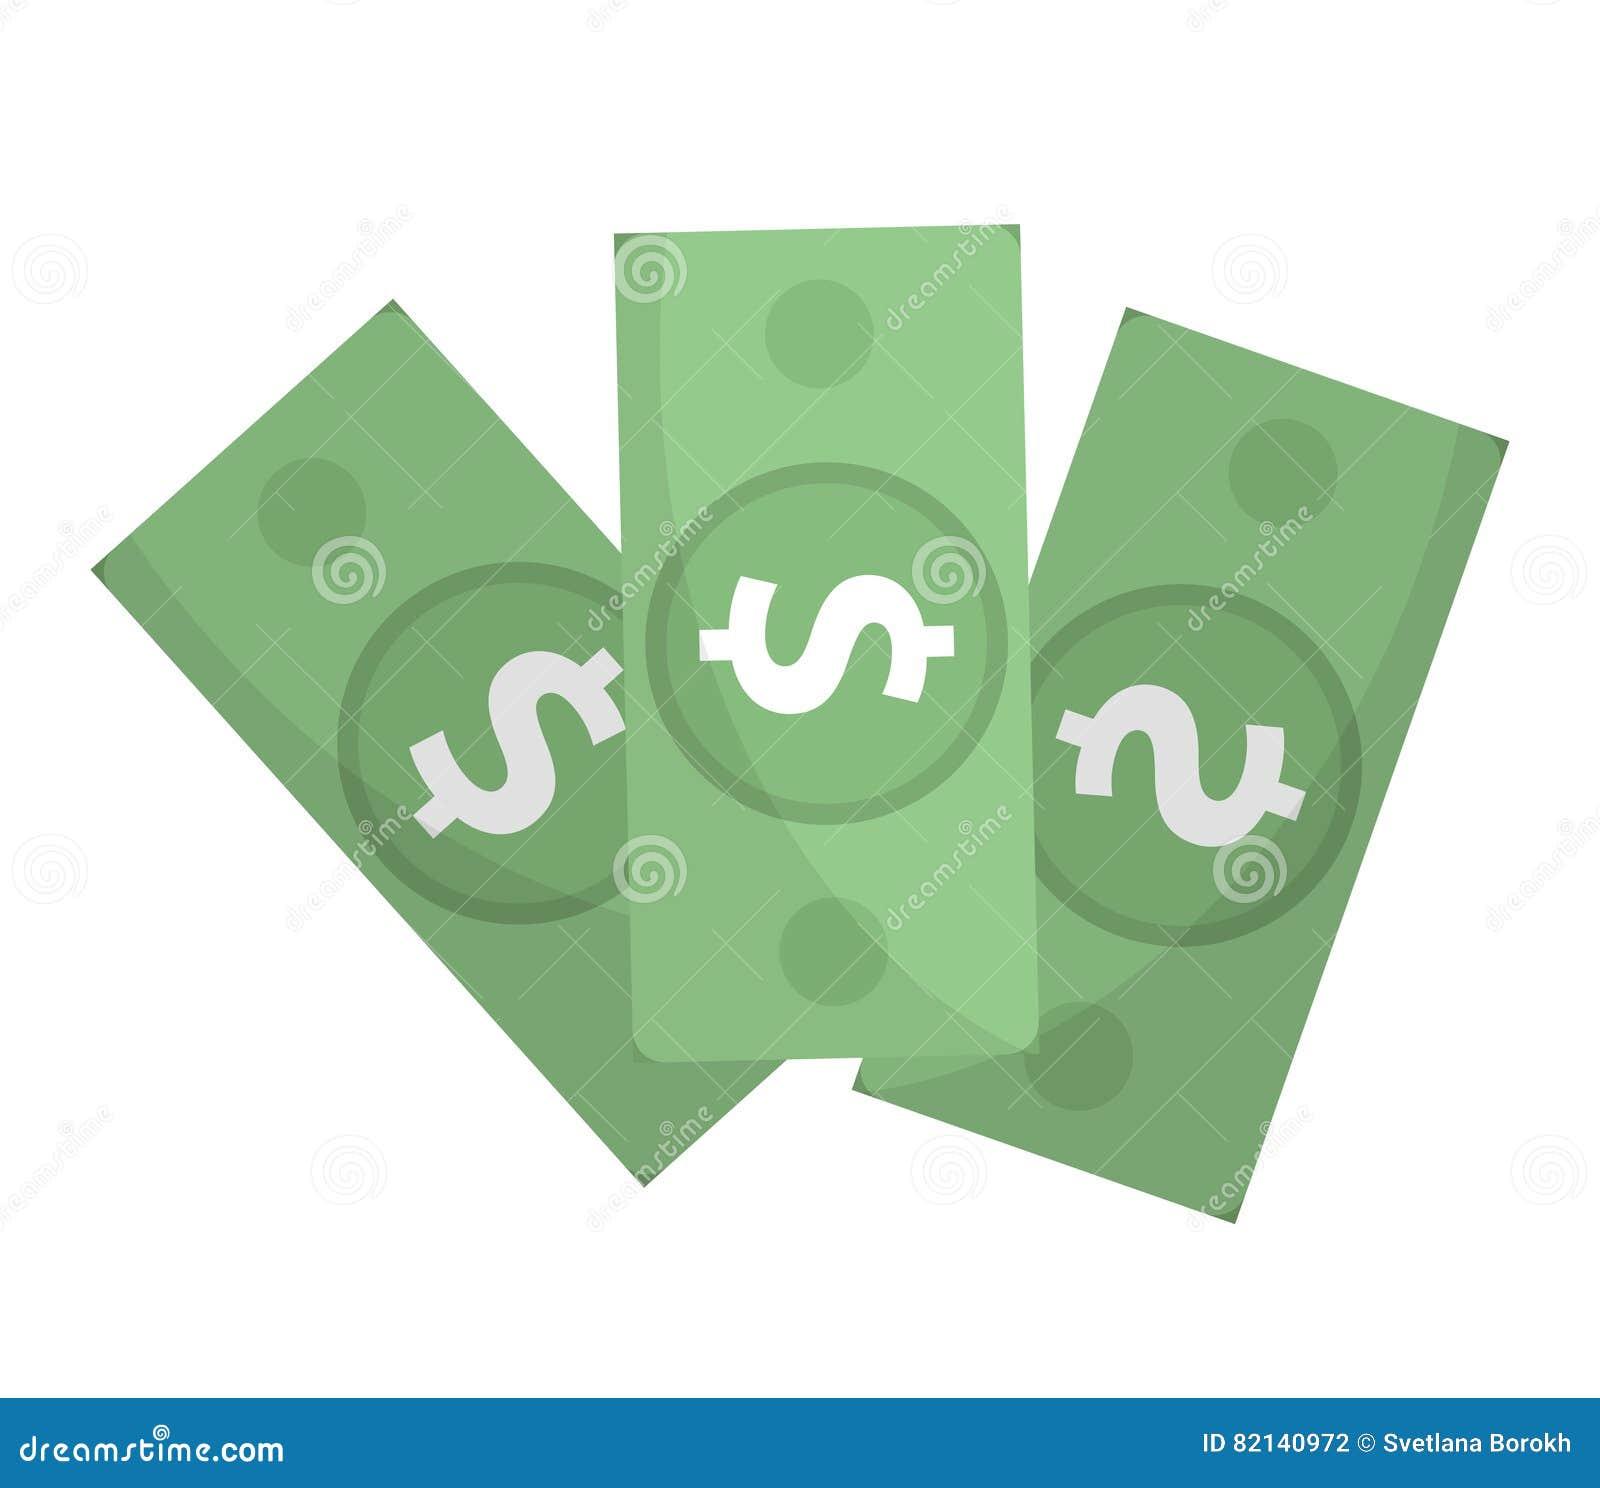 Designing dollars